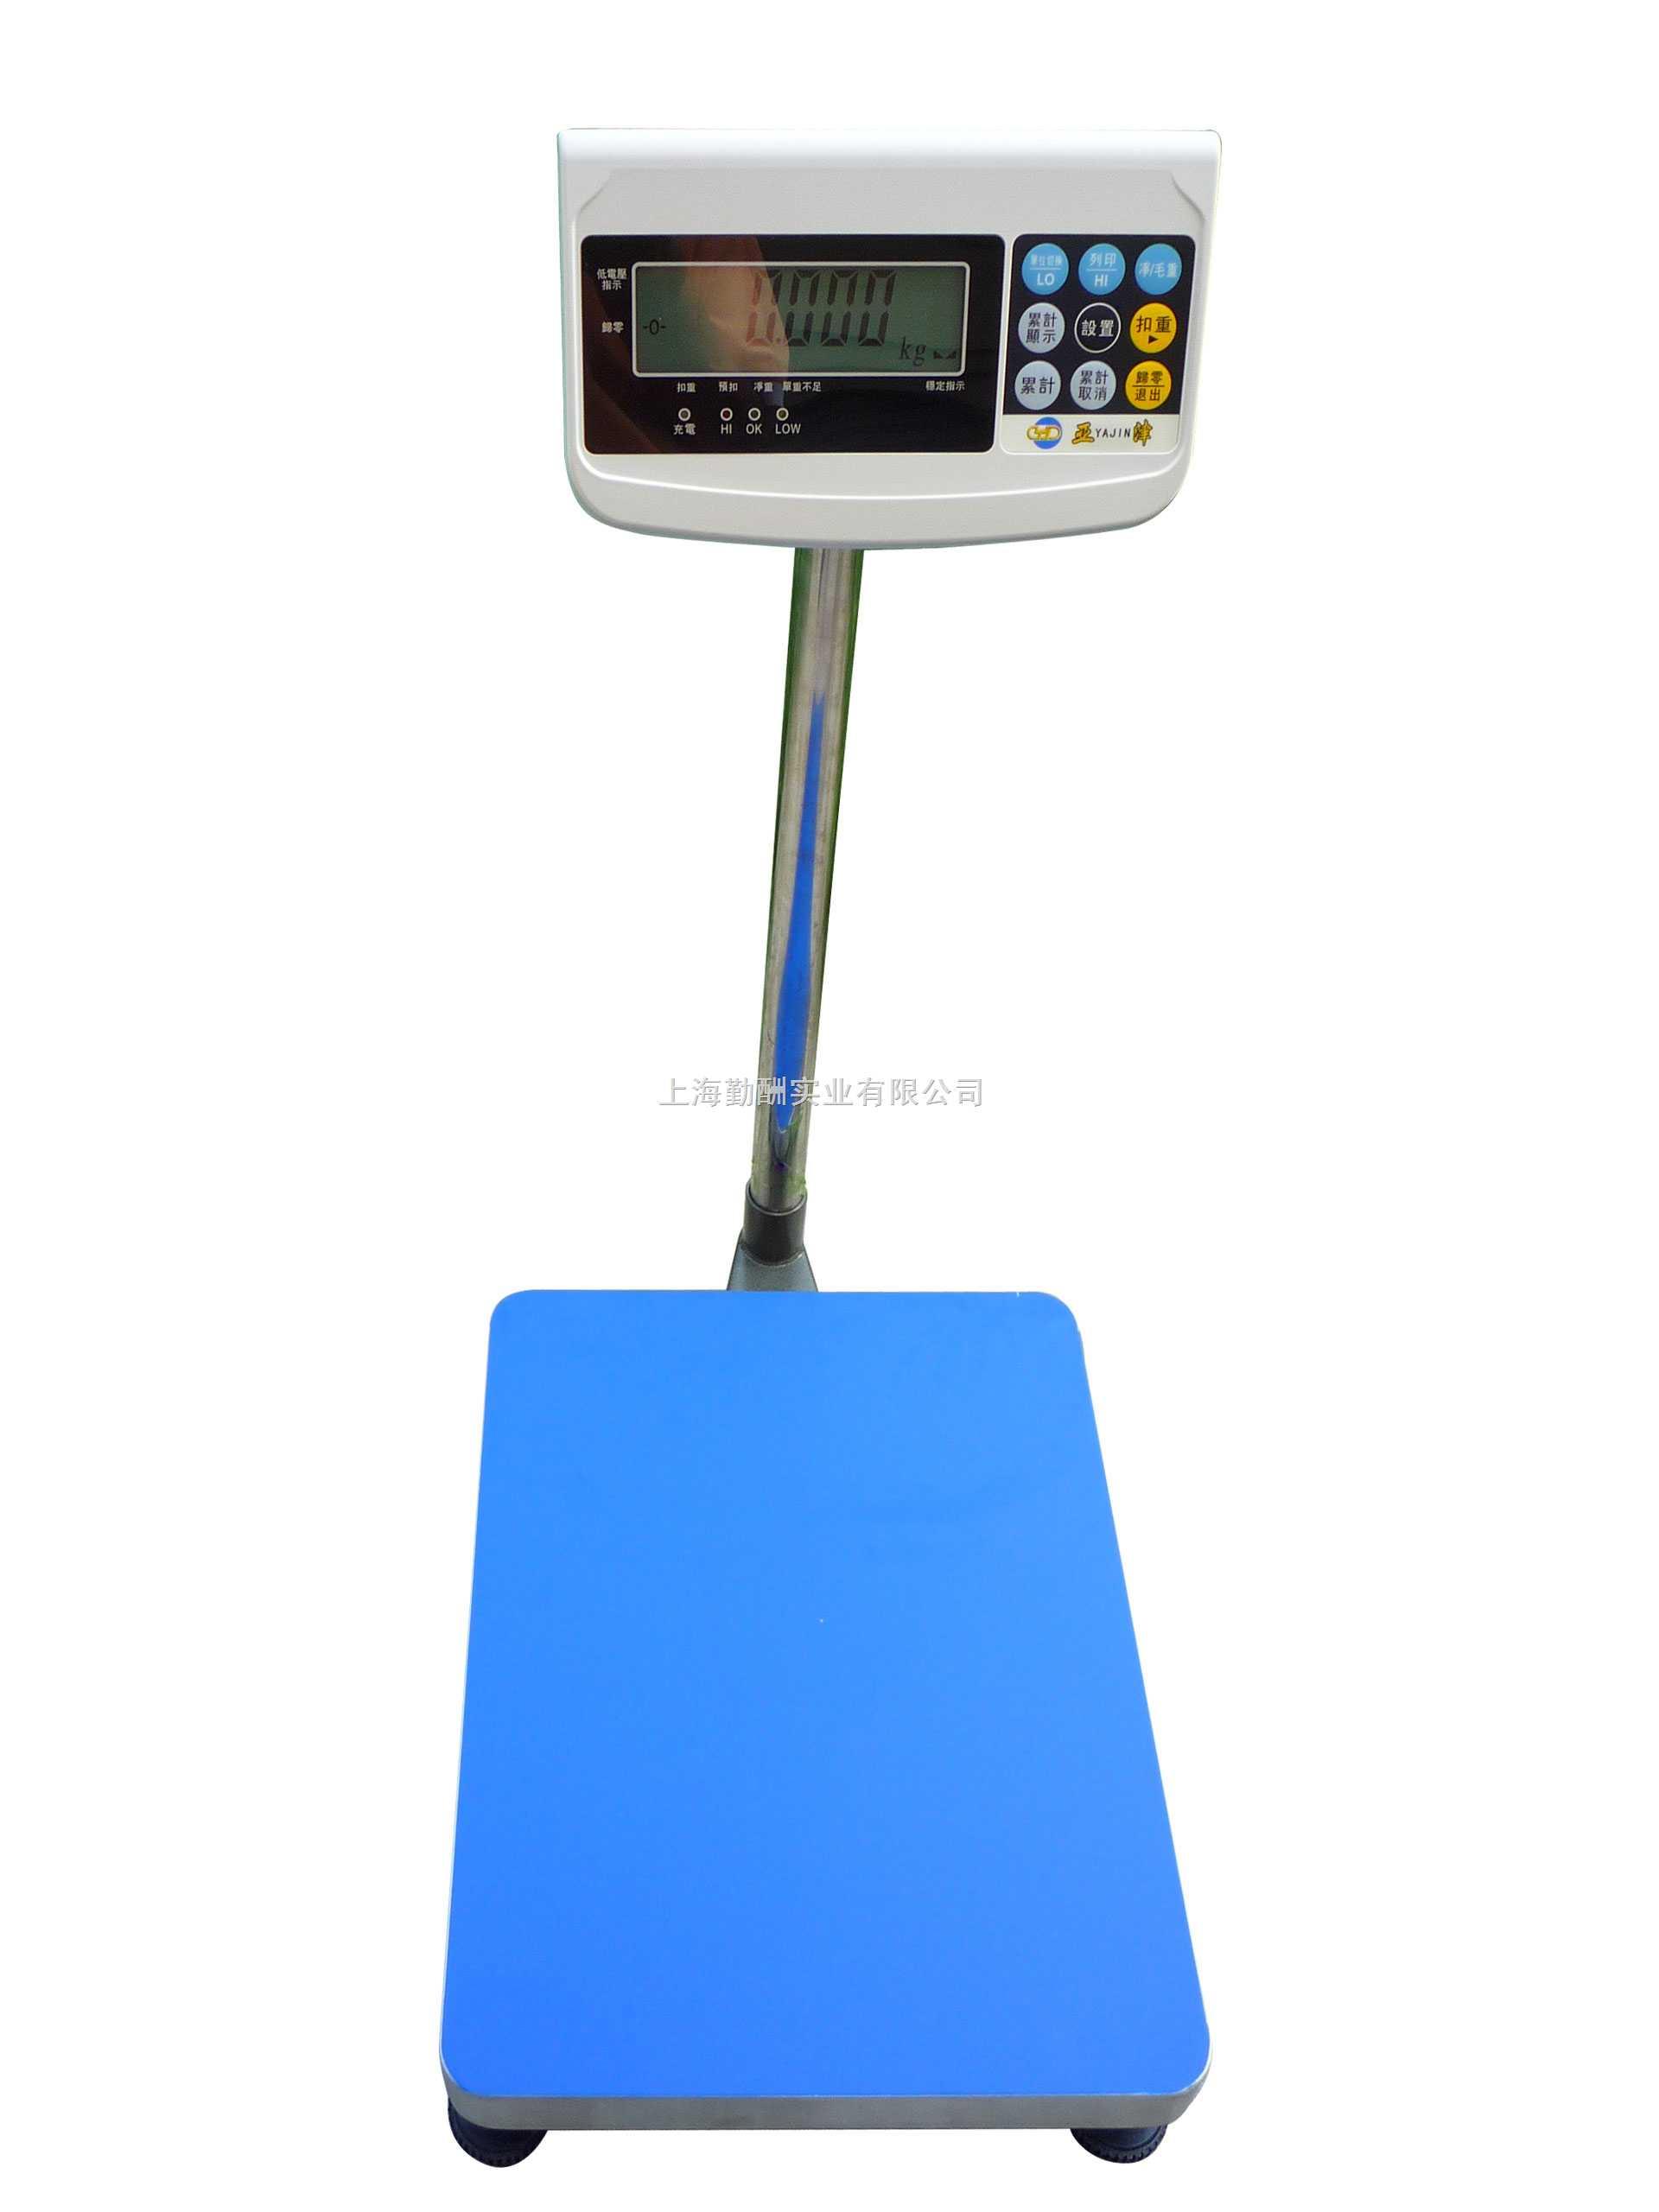 300kg台秤,深圳电子台秤,物流专用台秤N